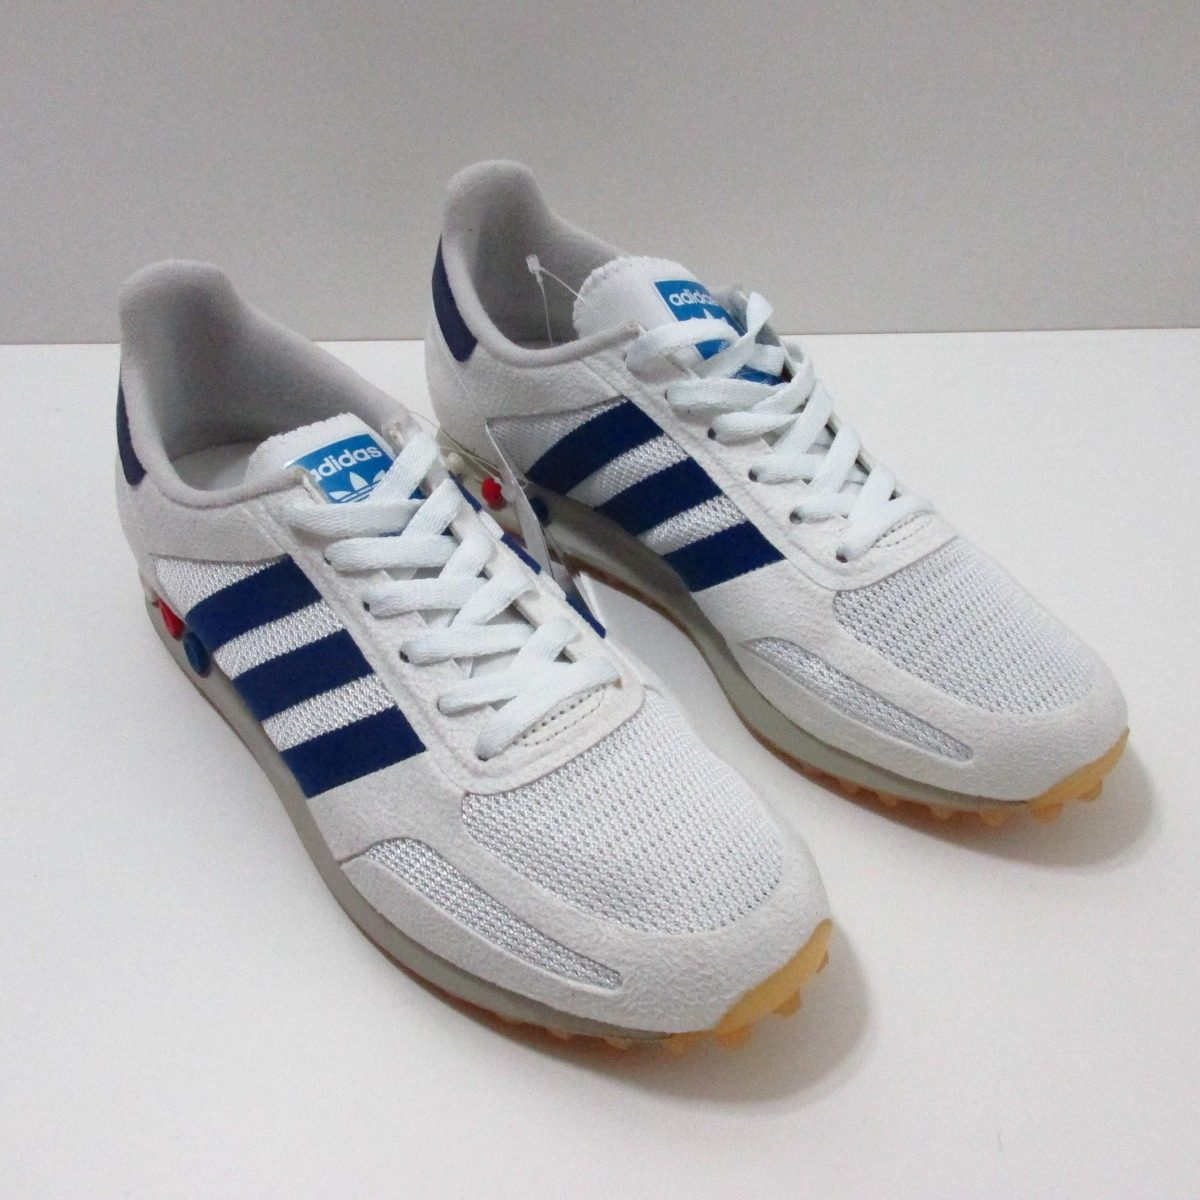 tênis masculino adidas originals la trainer produto europeu. Carregando zoom . ca4837a685f00